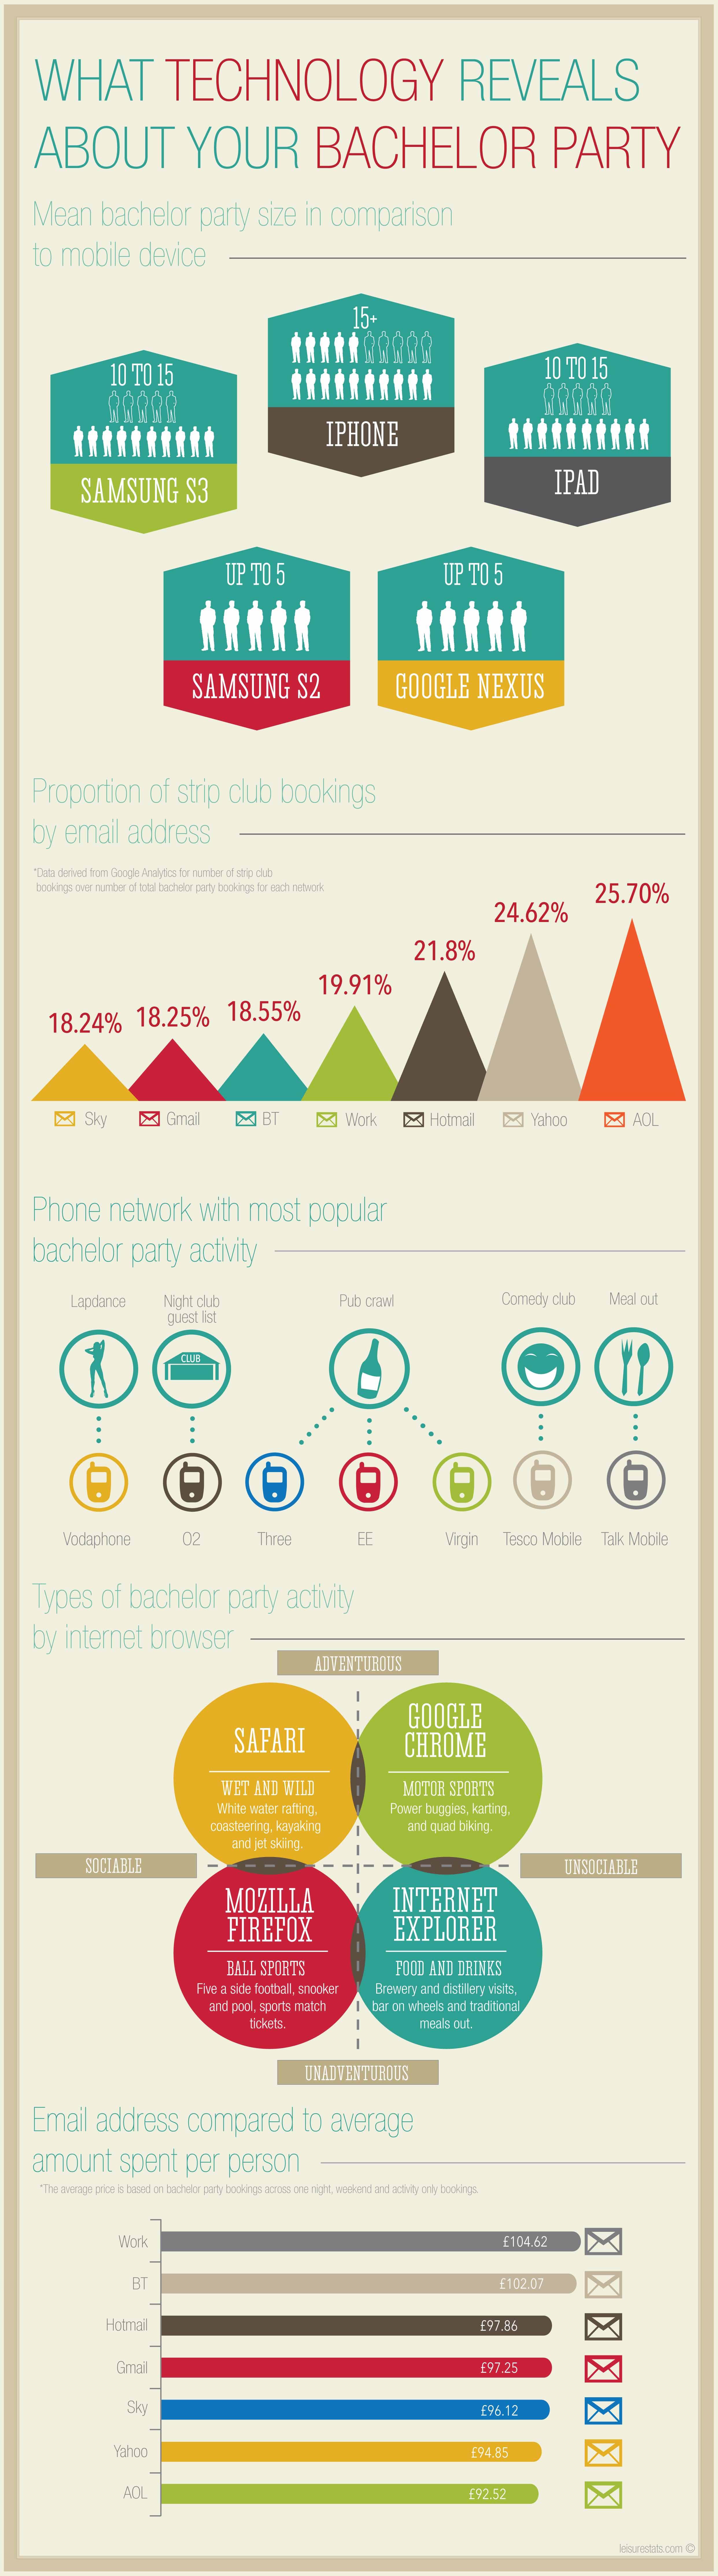 mobile and internet usage Statistics